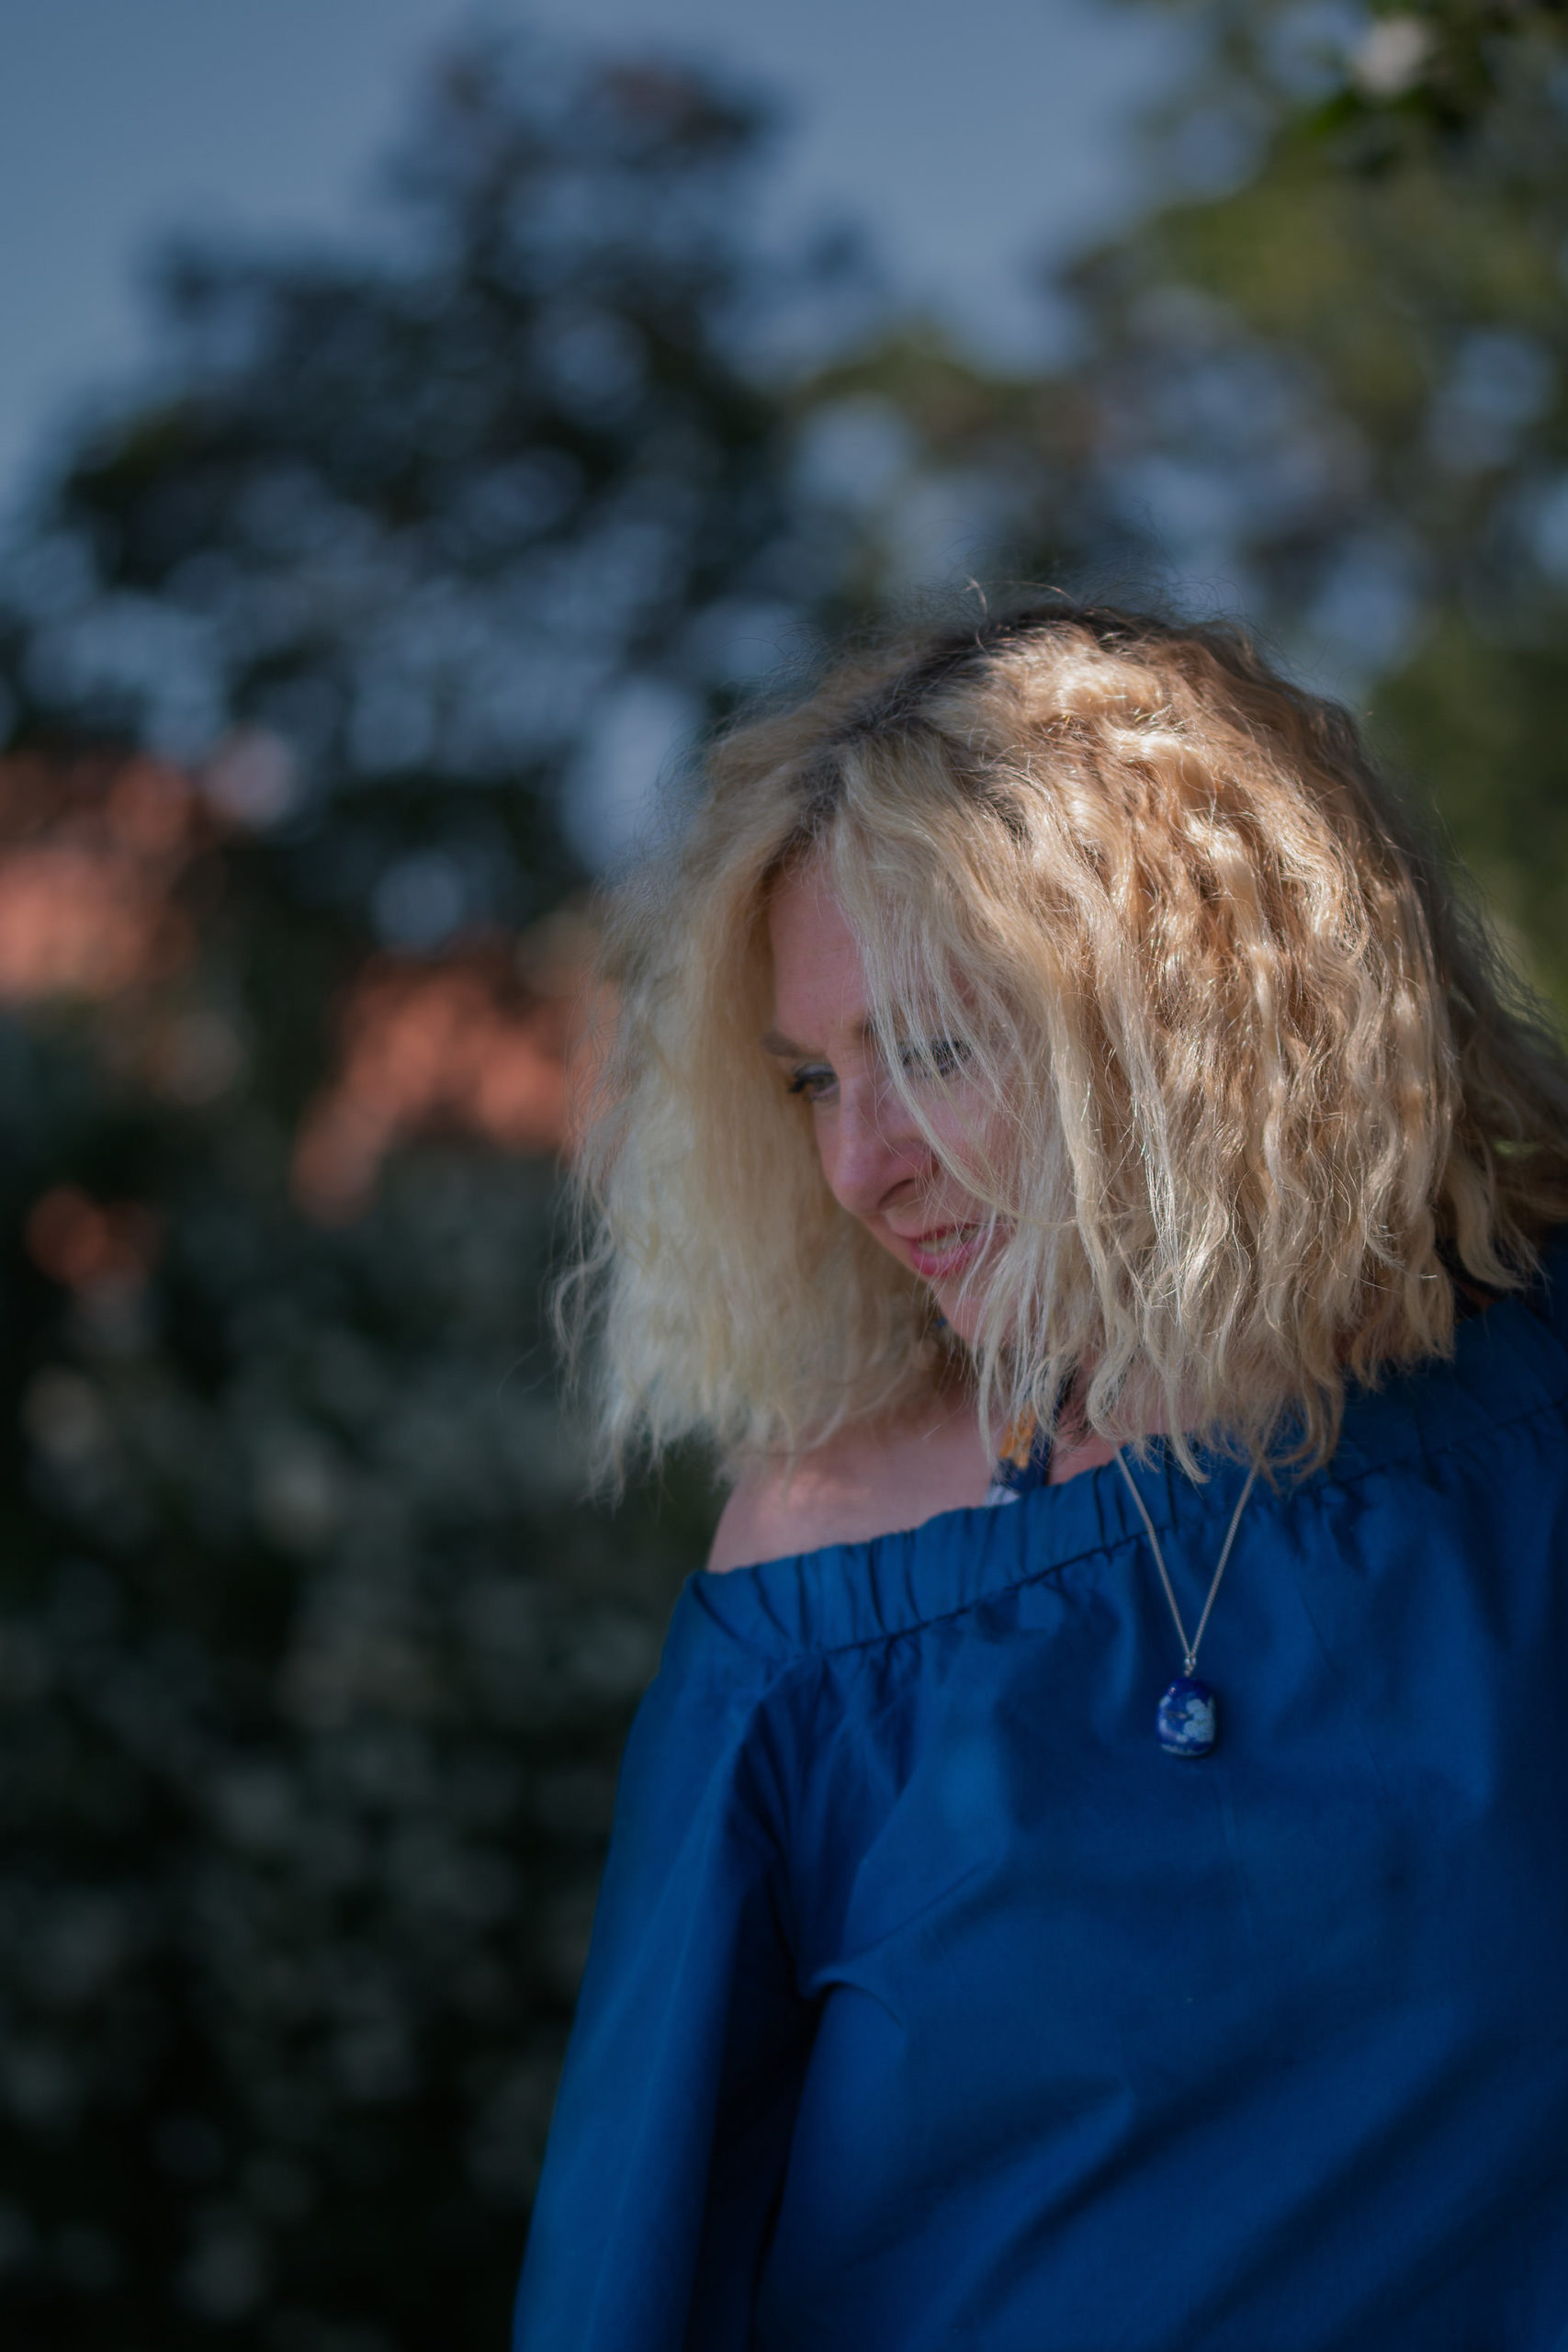 Porträttfotografering - Soulelle | Soulful Business & Web design